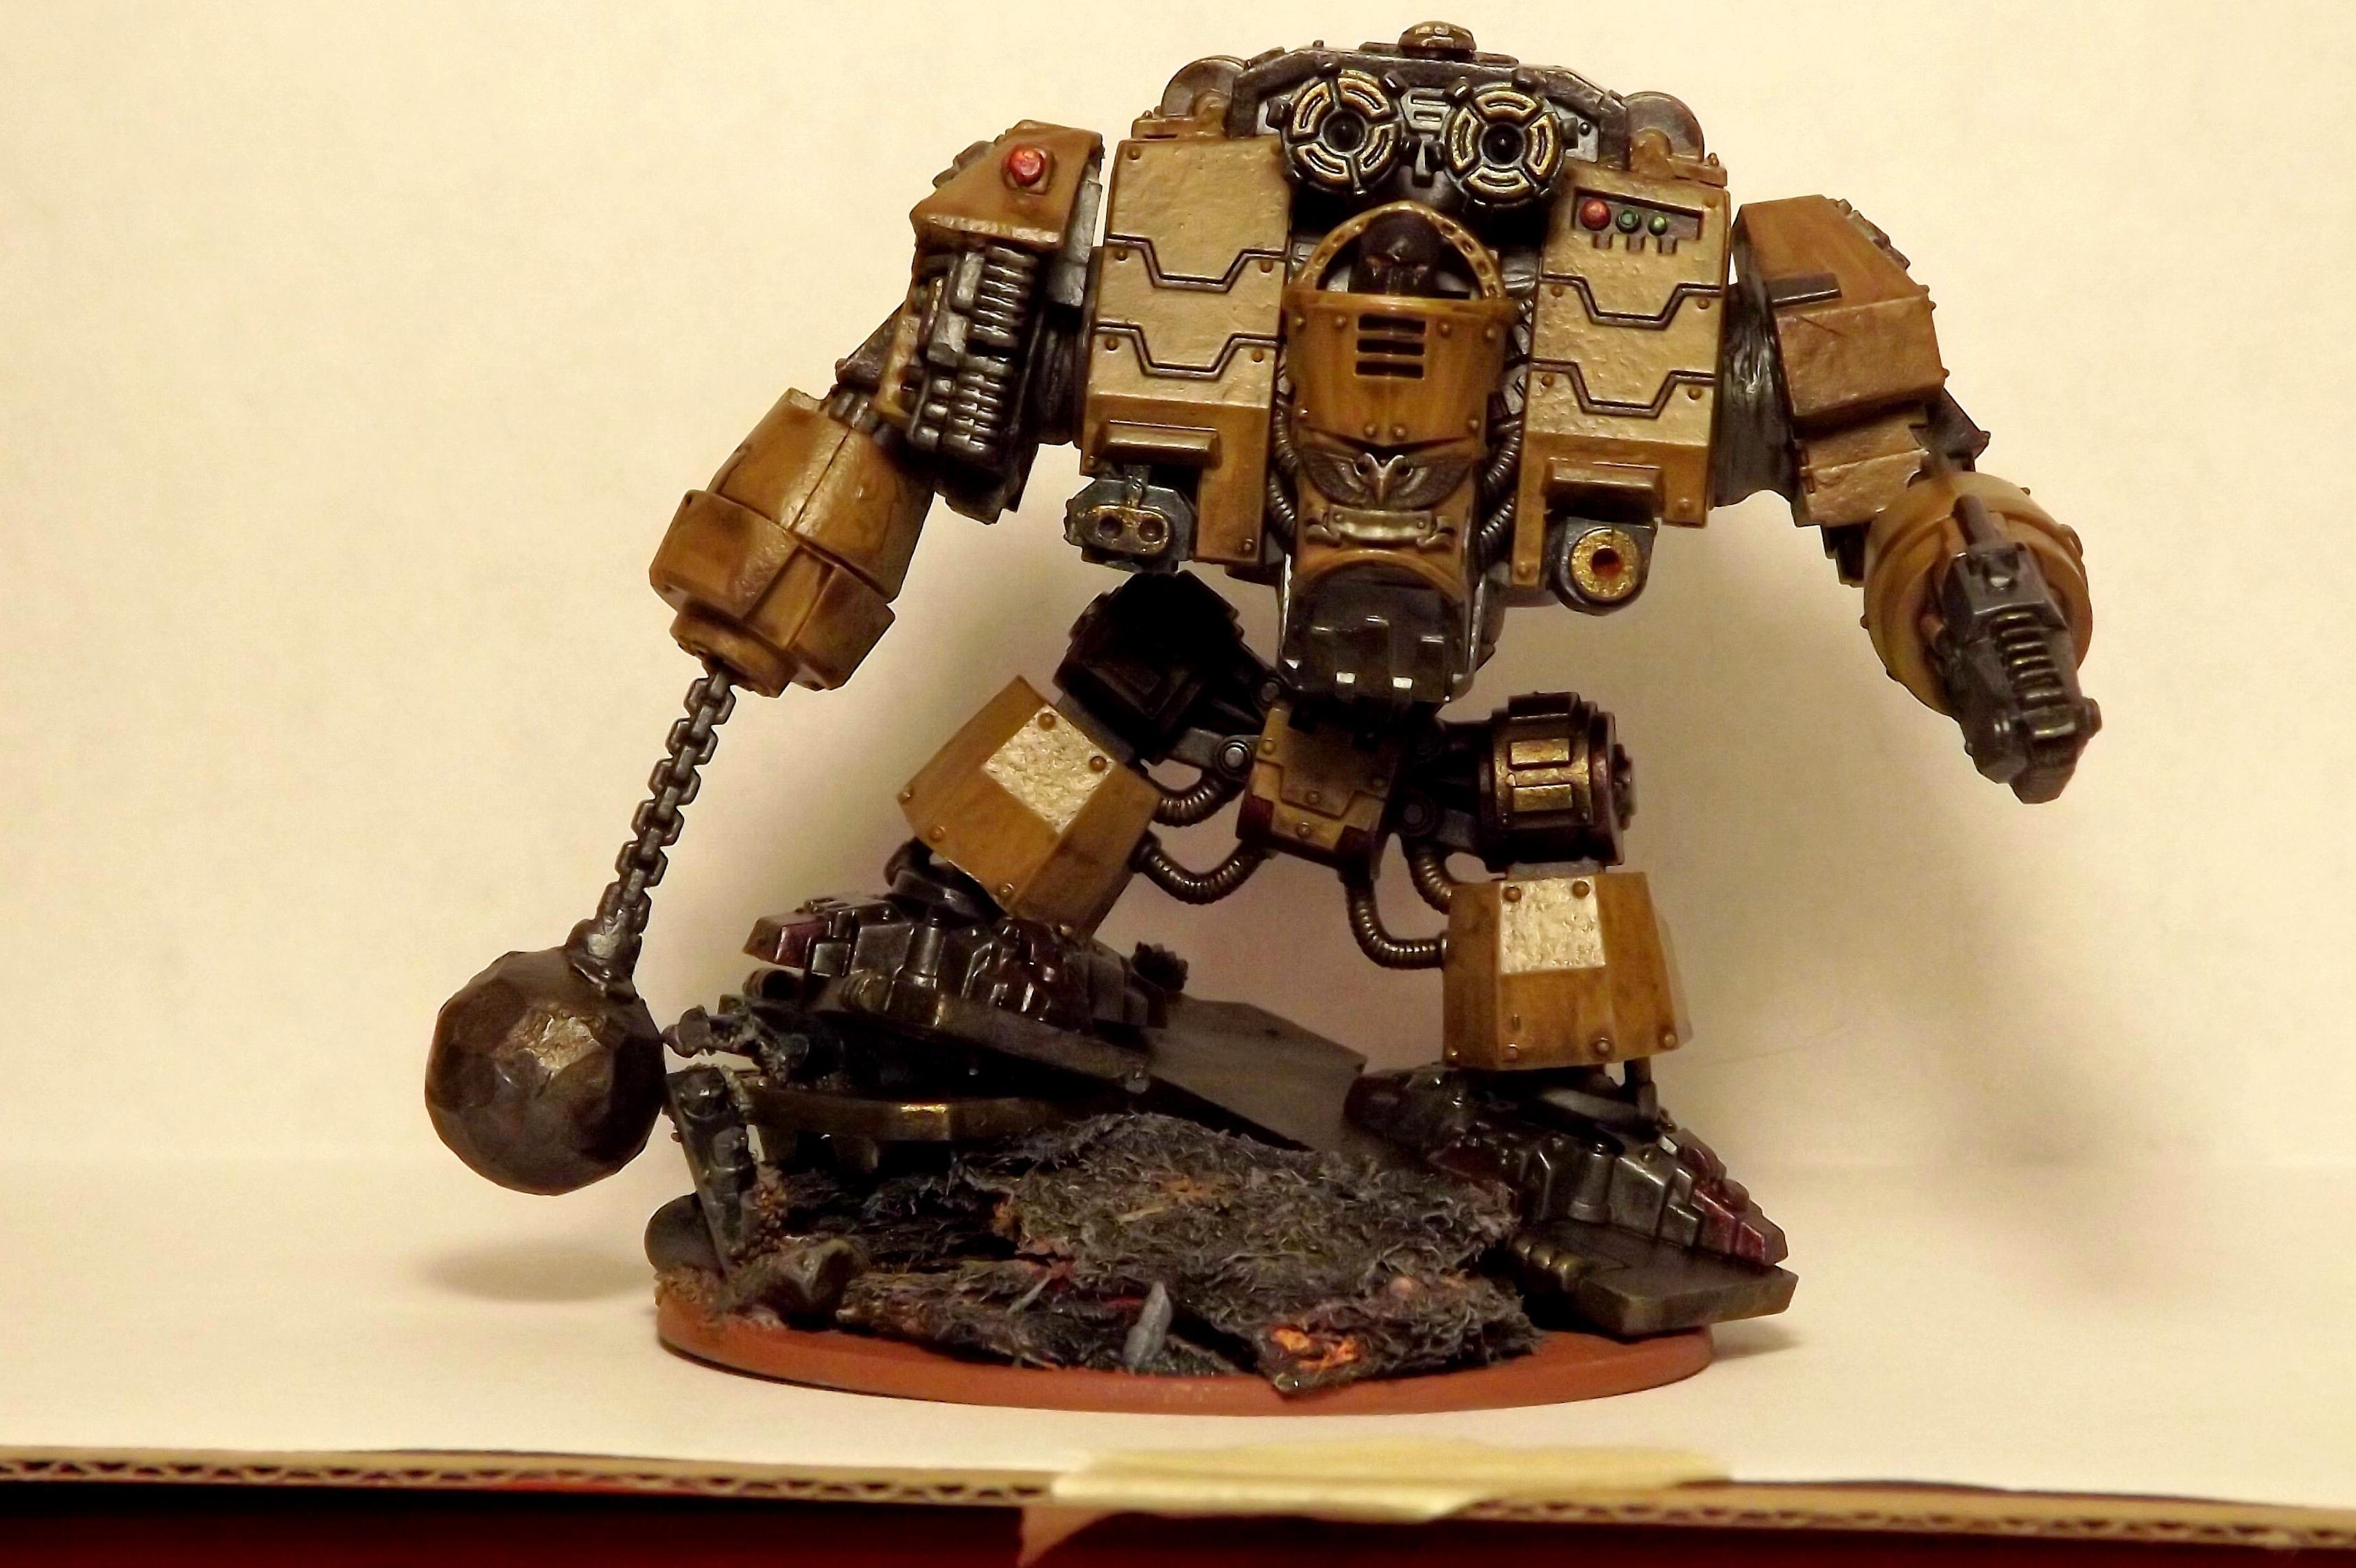 Crapnought, Dreadnought, Ironclad